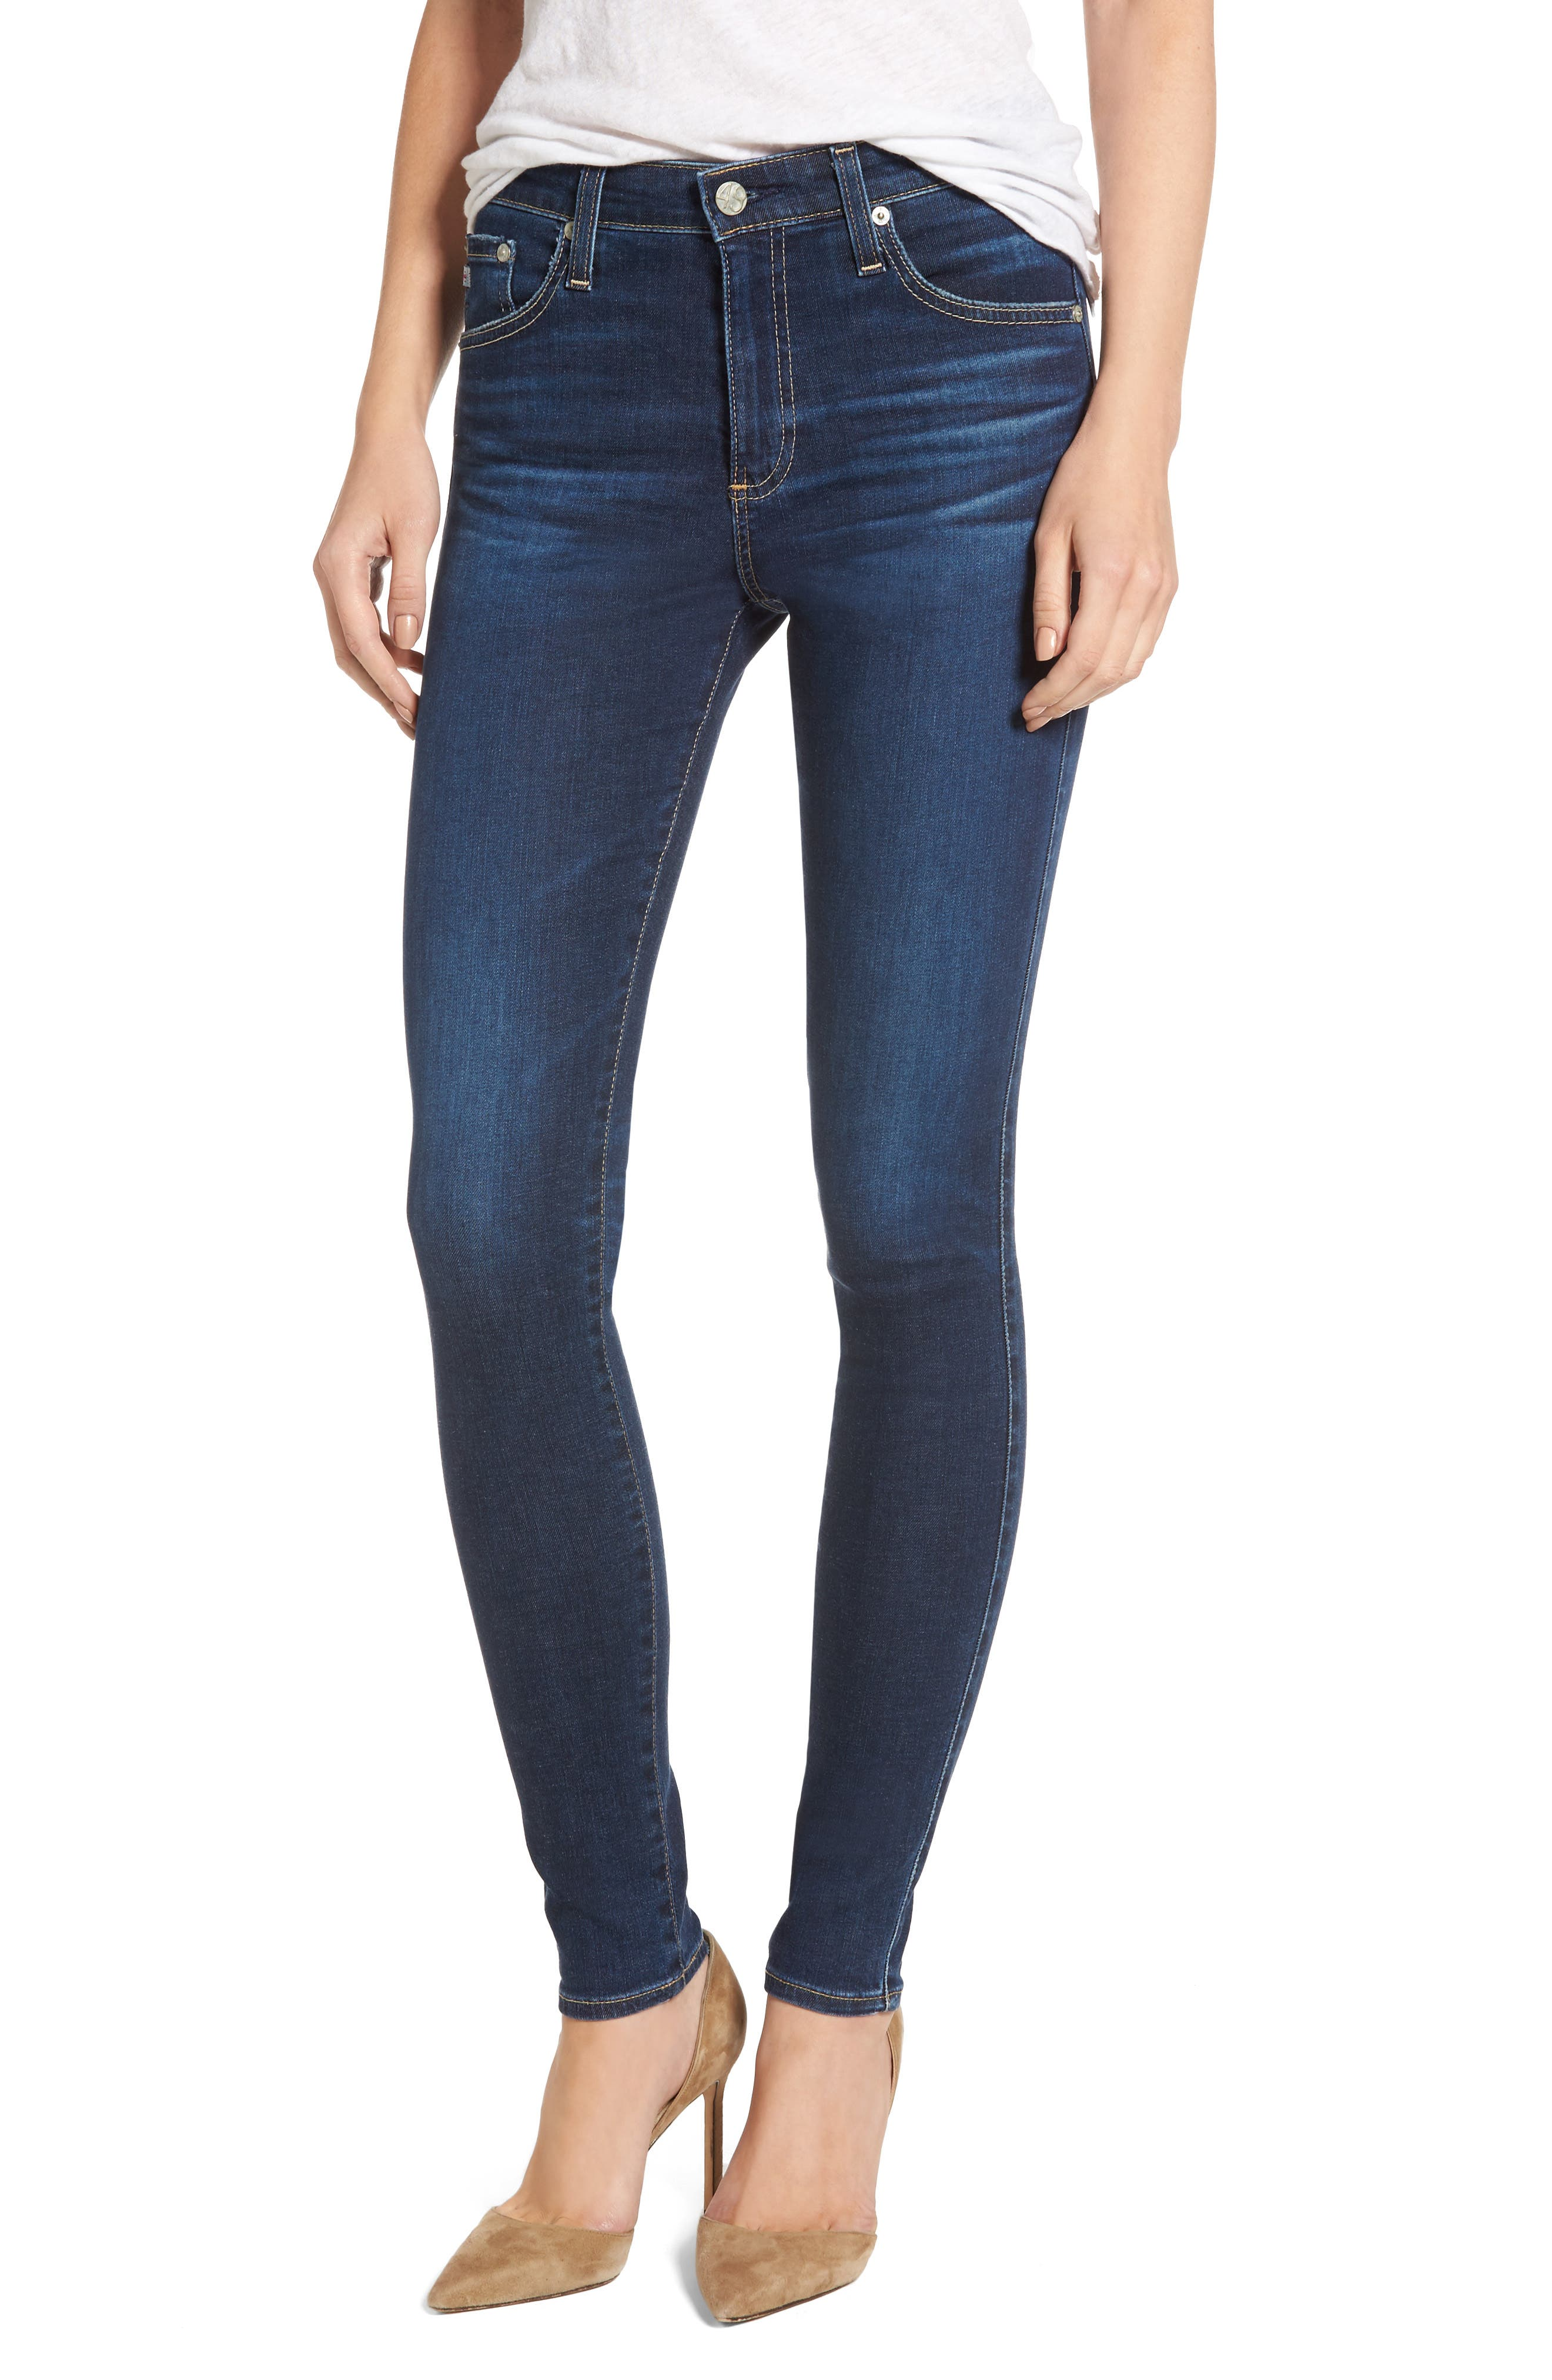 'The Farrah' High Rise Skinny Jeans,                             Main thumbnail 6, color,